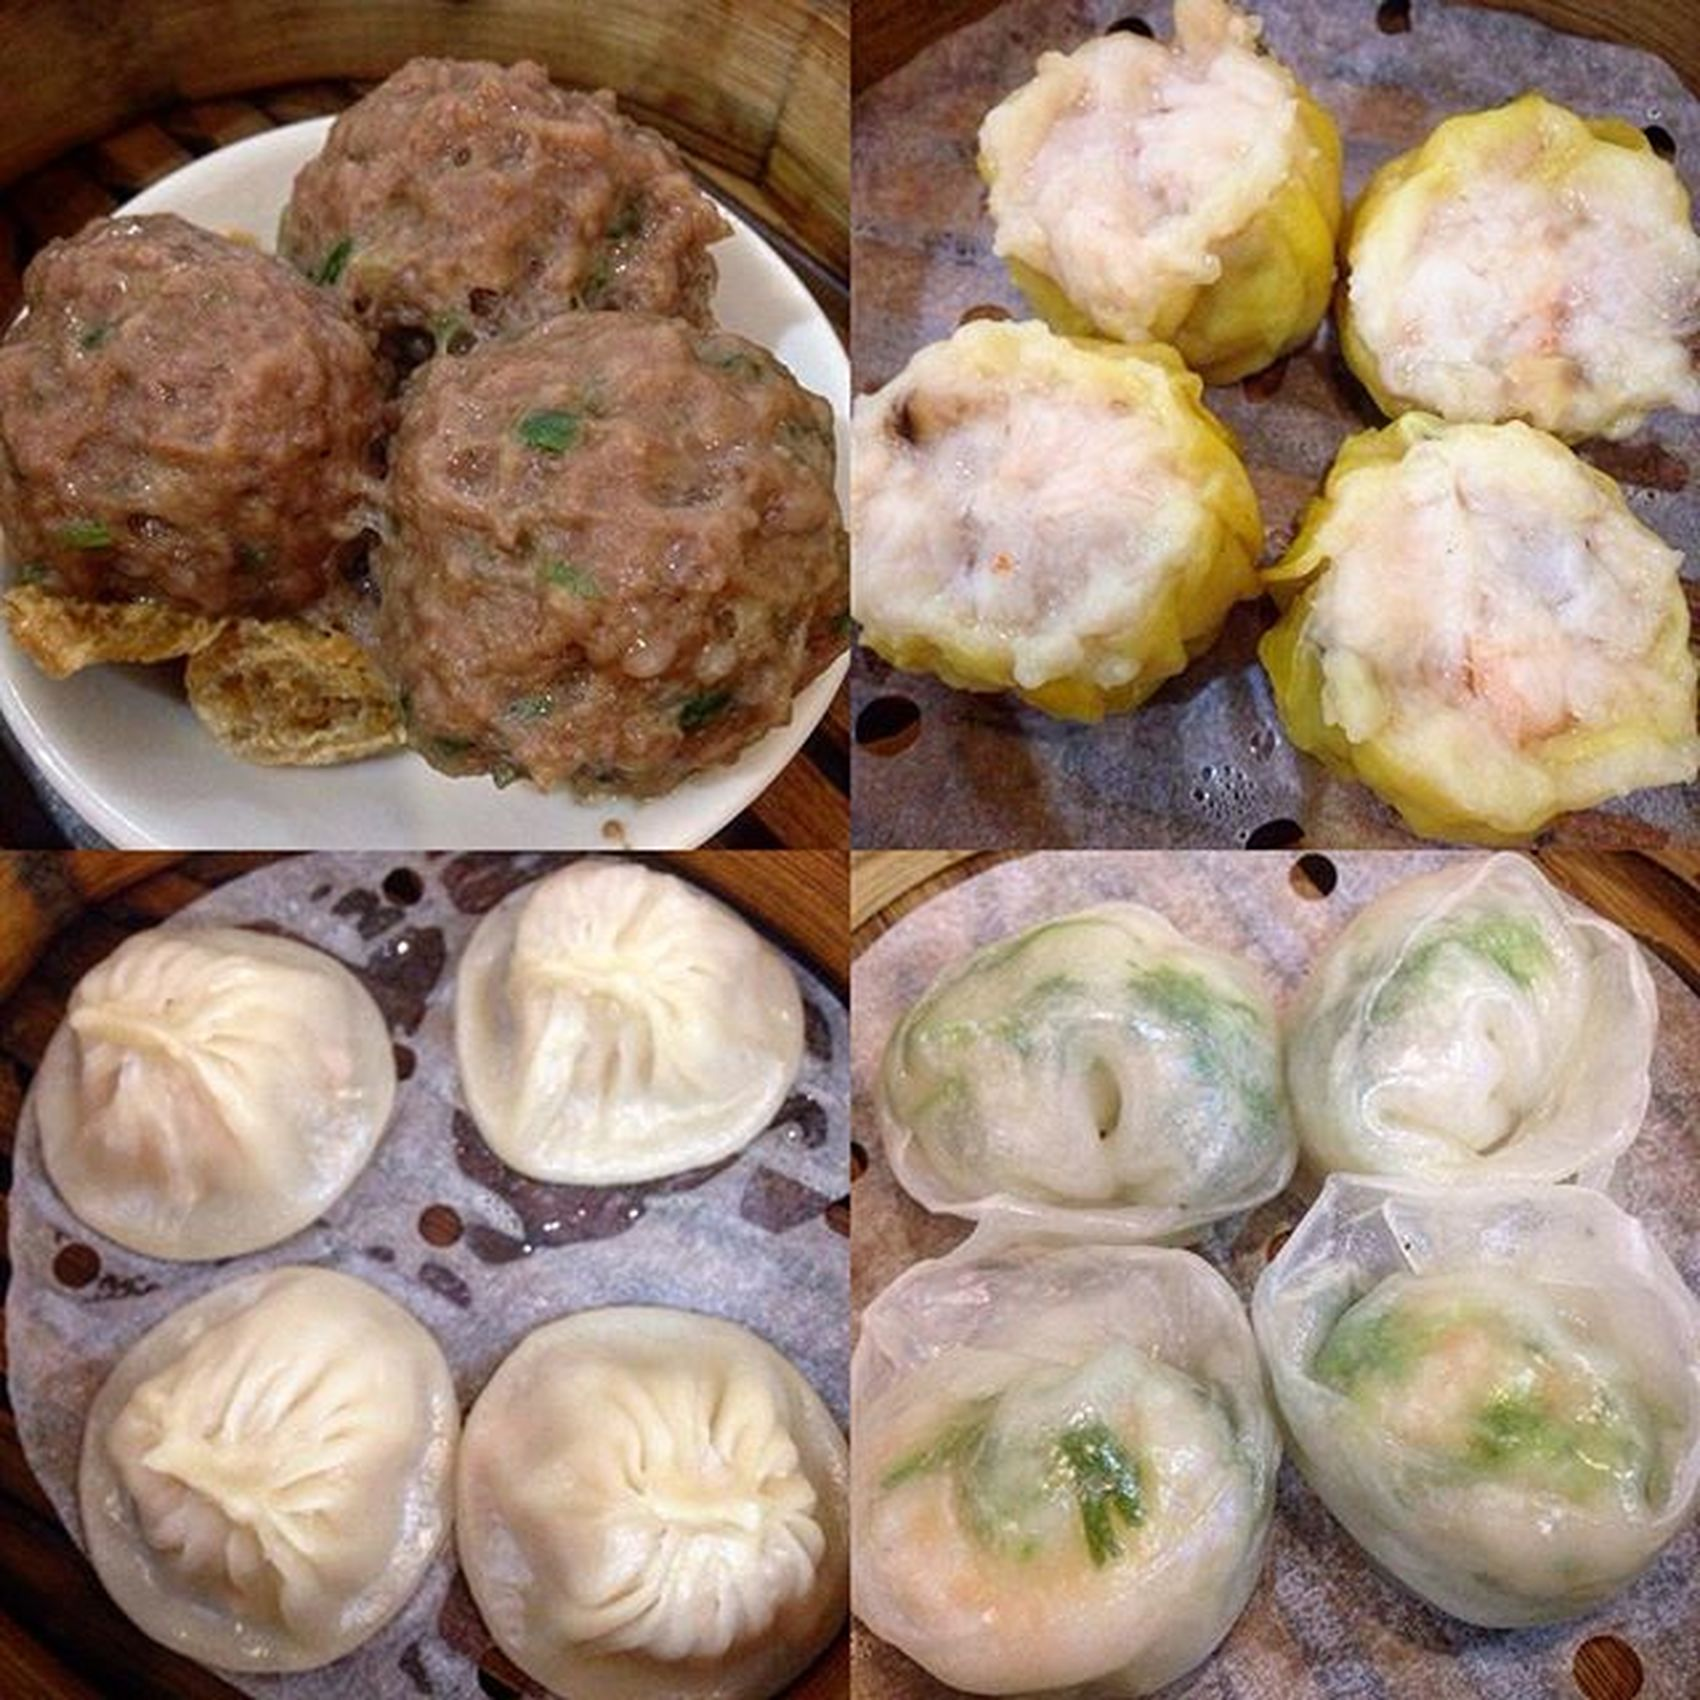 02/08/2016 Chinesenewyear Dimsum Breakfast Luckyrainbowrestaurant Luckyrainbow